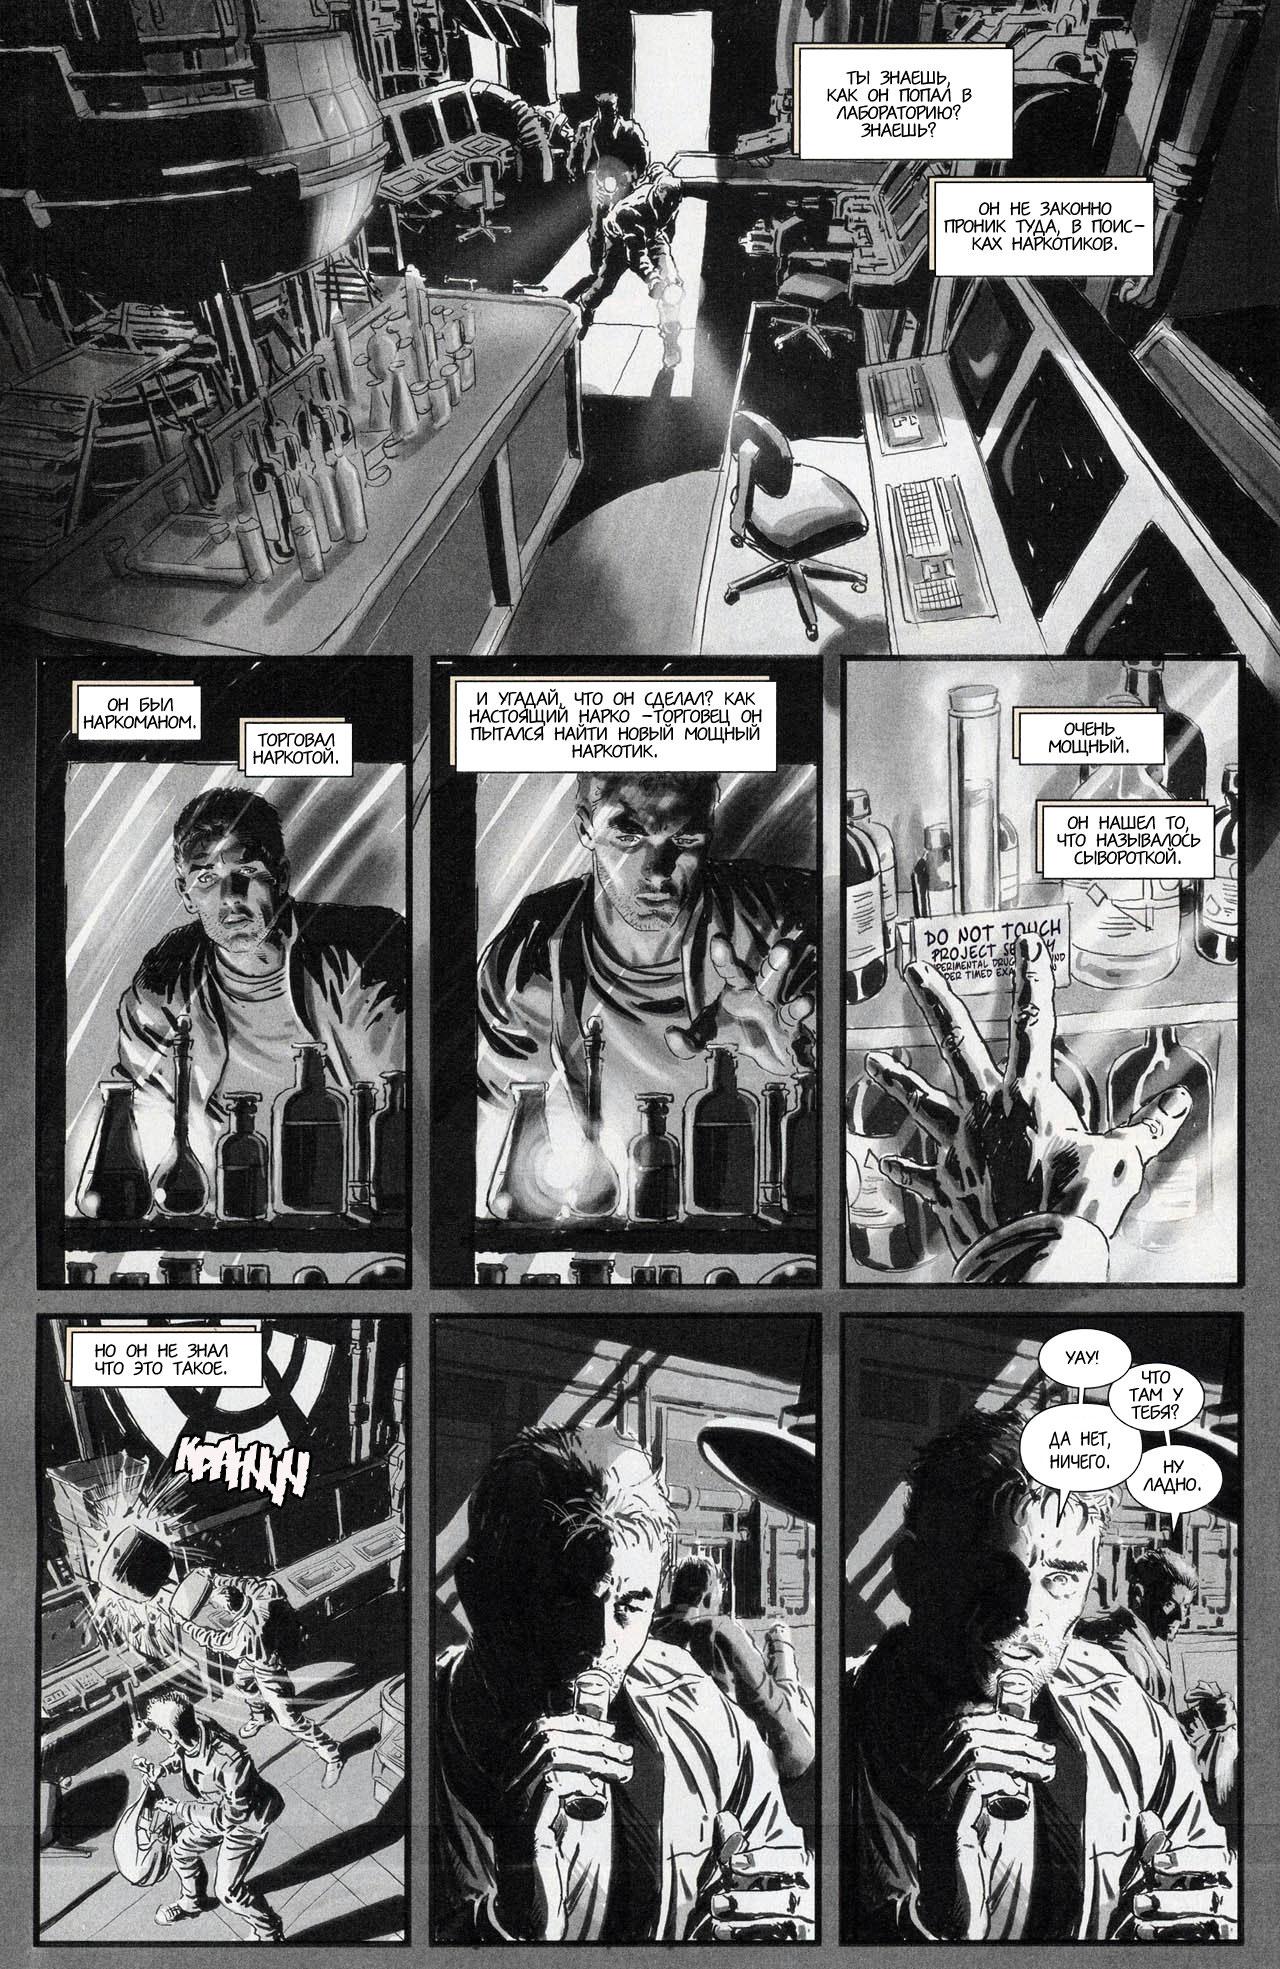 DARK AVENGERS 13 TO 16 ANN 1 SEIGE  STORY ARC BRIAN BENDIS MARVEL COMICS